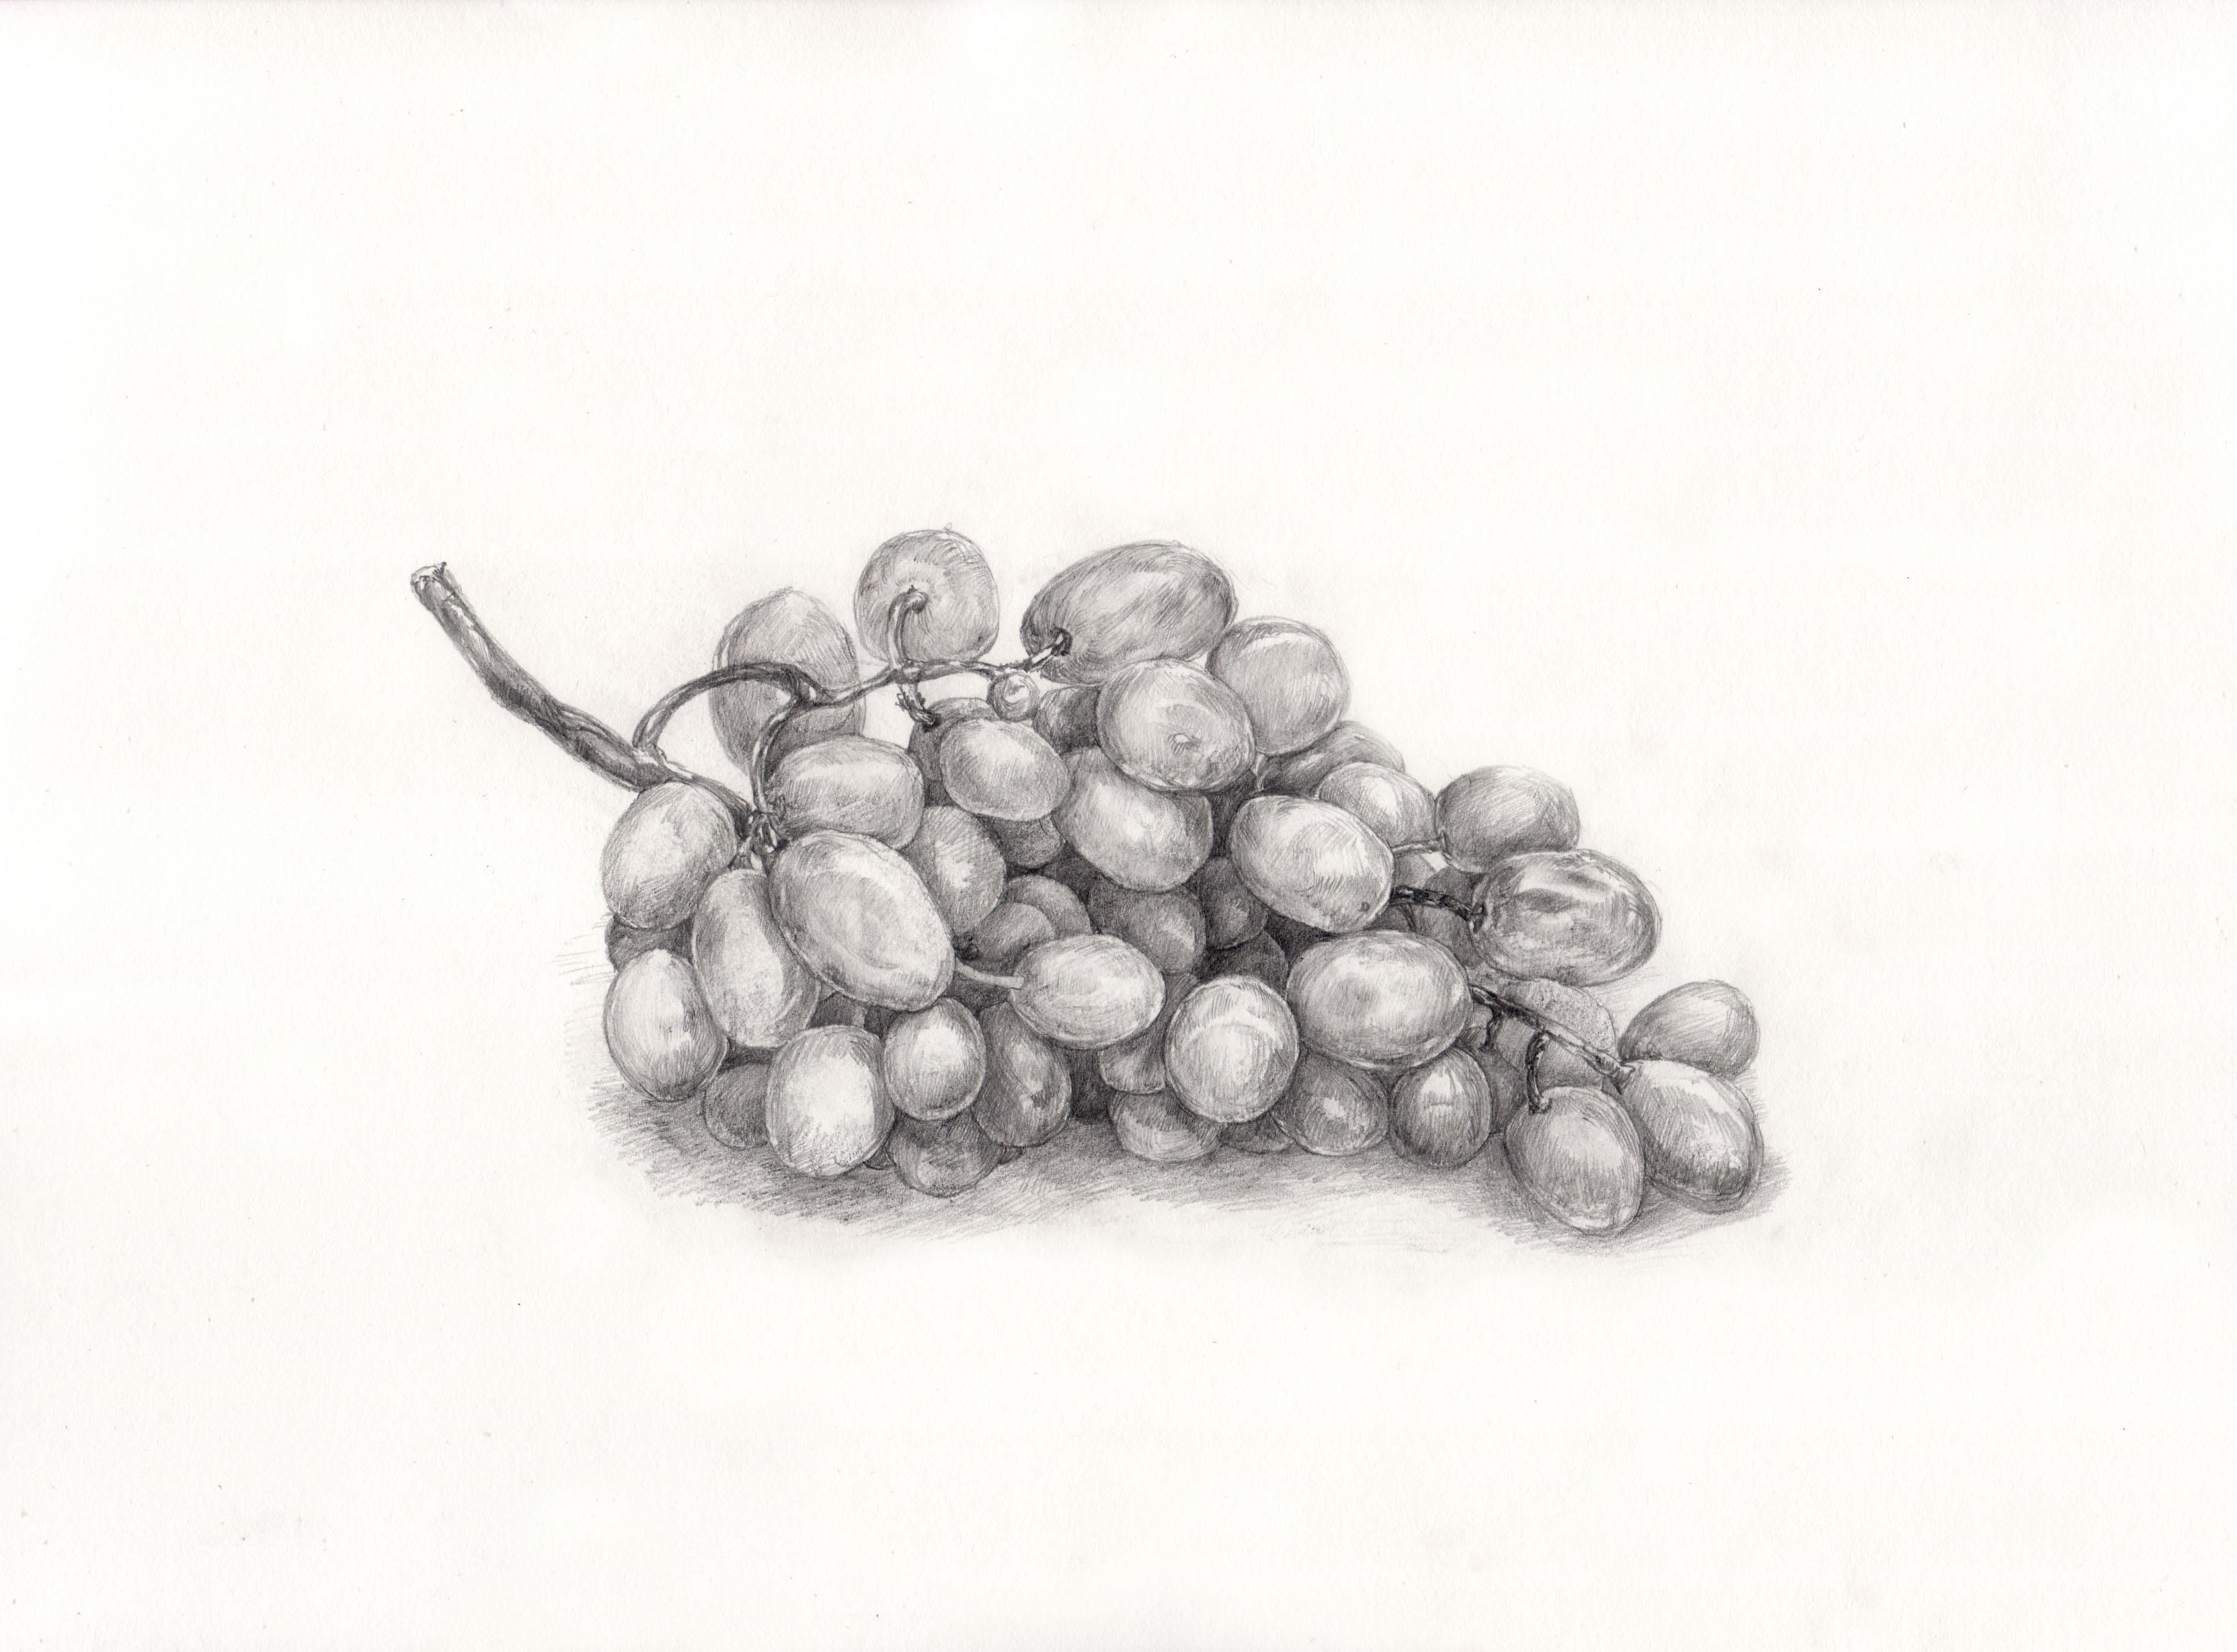 Gambar Cabang Anggur Buah Makanan Menghasilkan Titisan